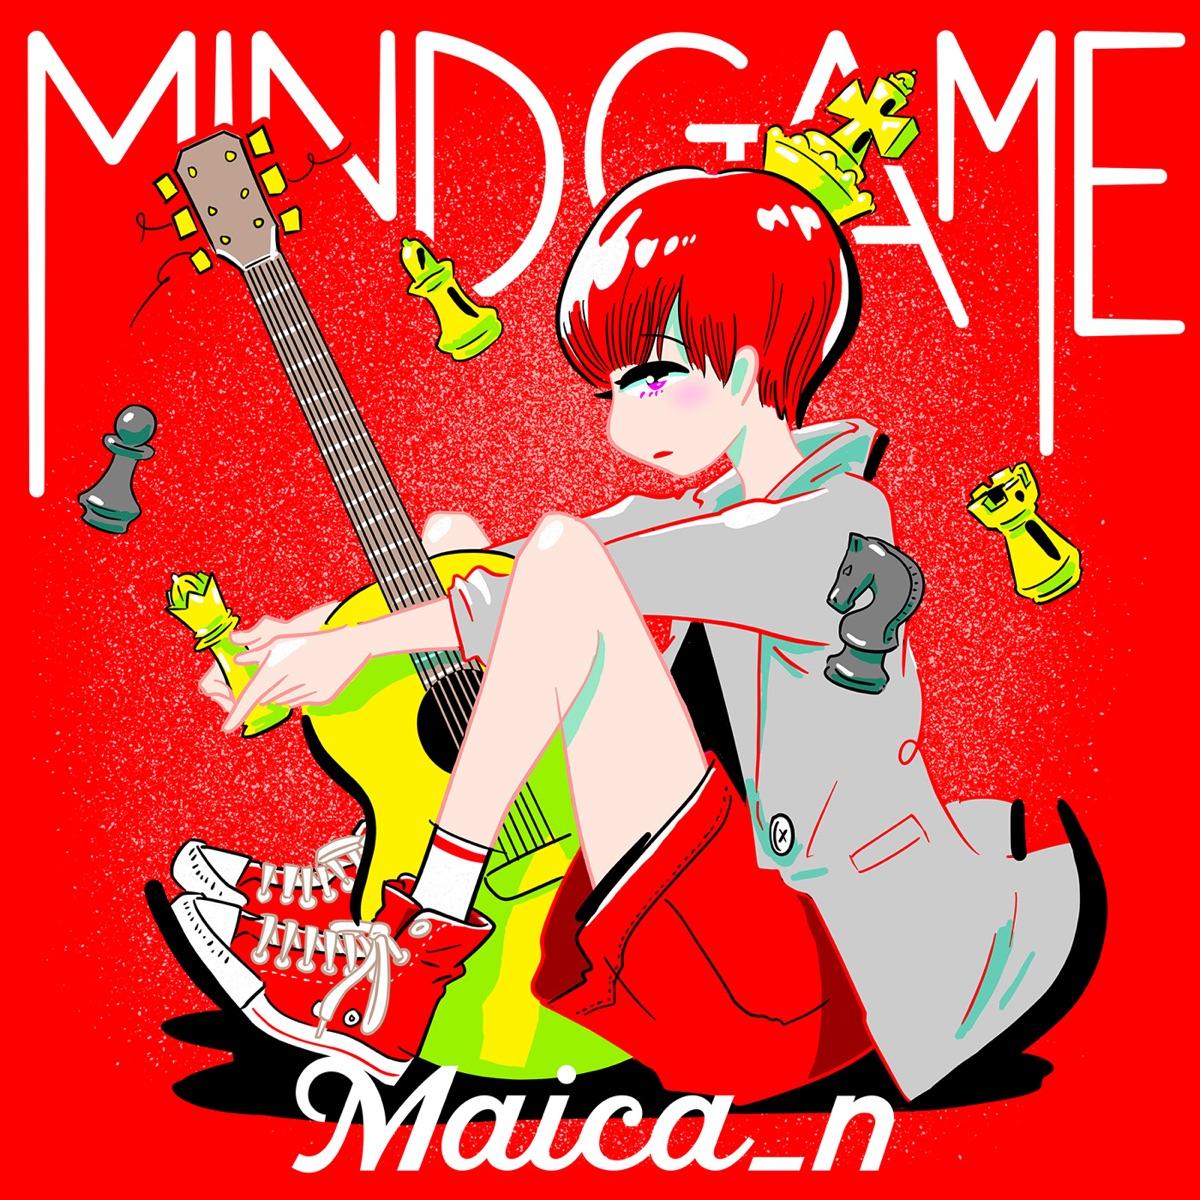 『Maica_n - Mind game』収録の『Mind game』ジャケット